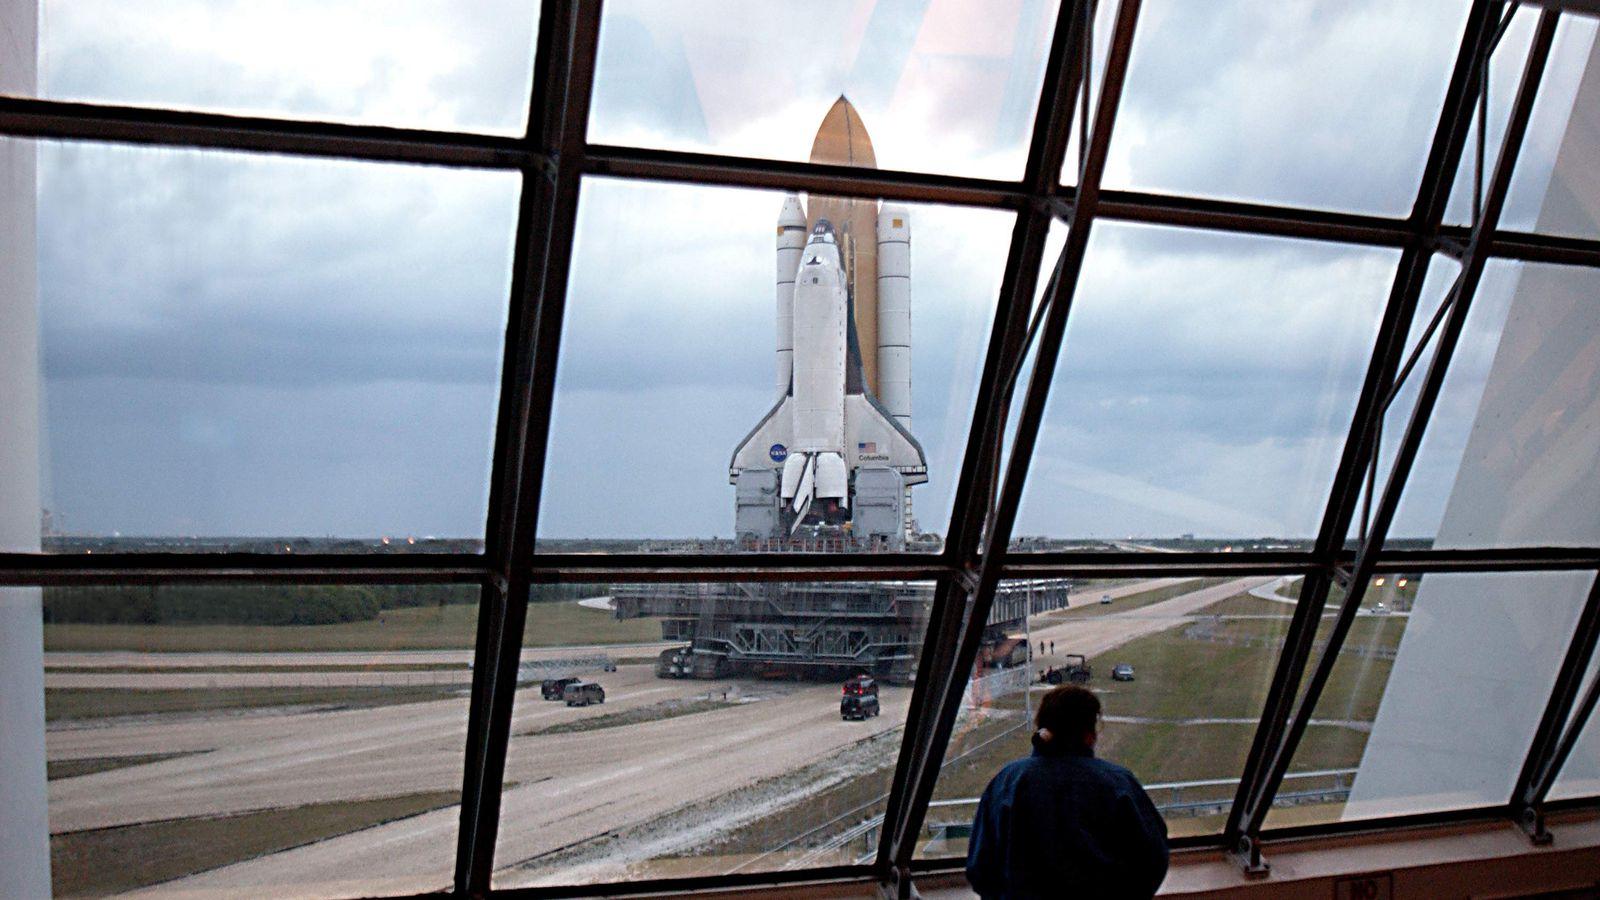 space shuttle columbia 2017 - photo #36